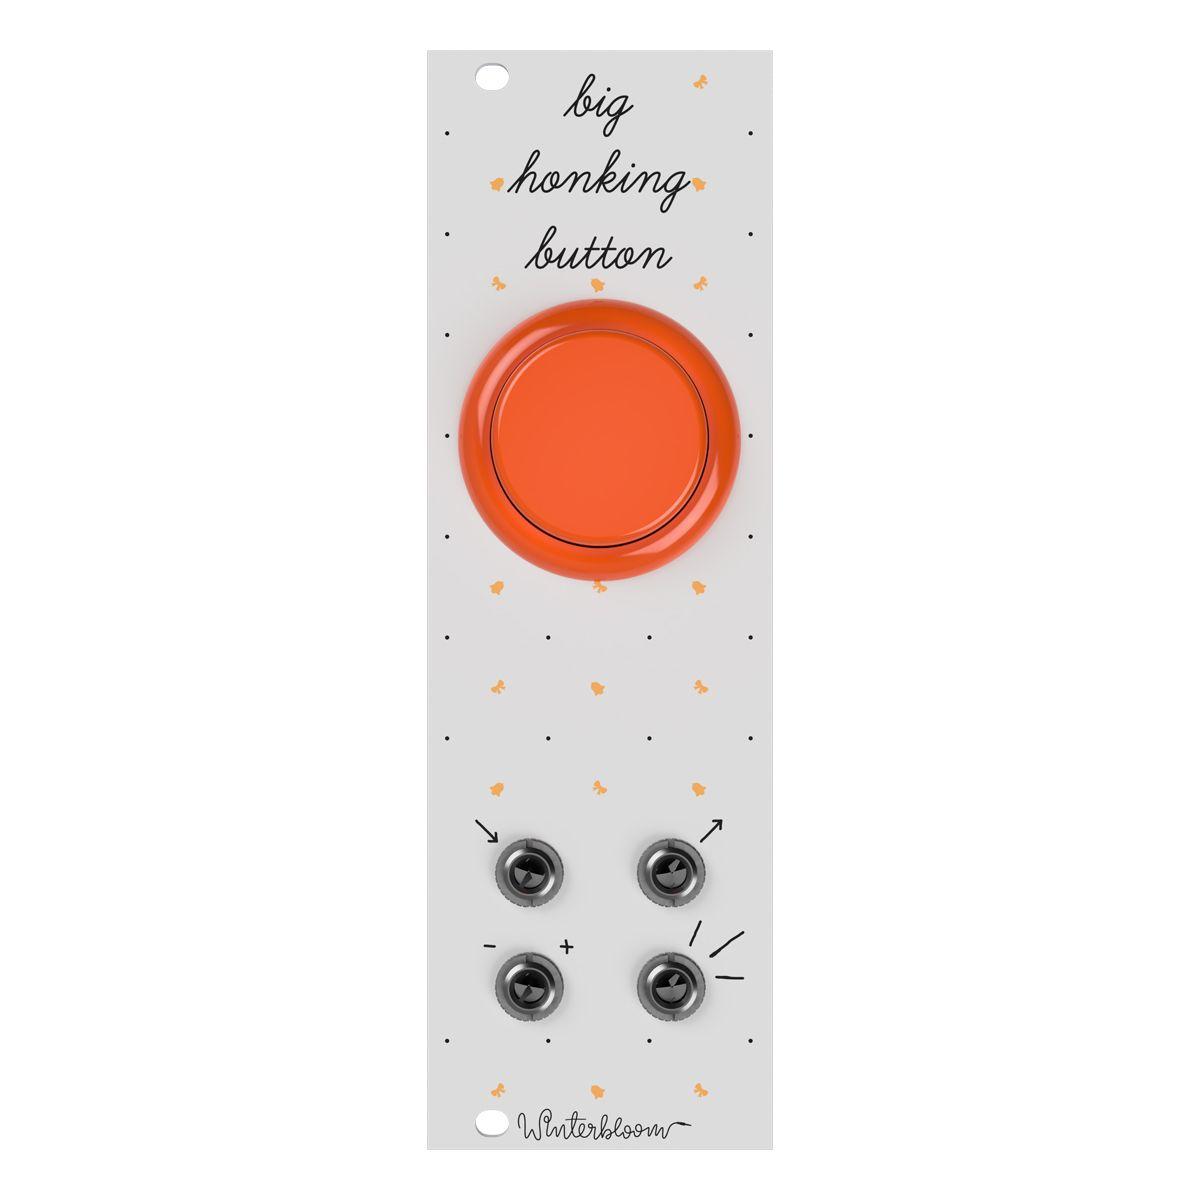 Winterbloom Big Honking Button Eurorack Sample Trigger Module (White/Orange)